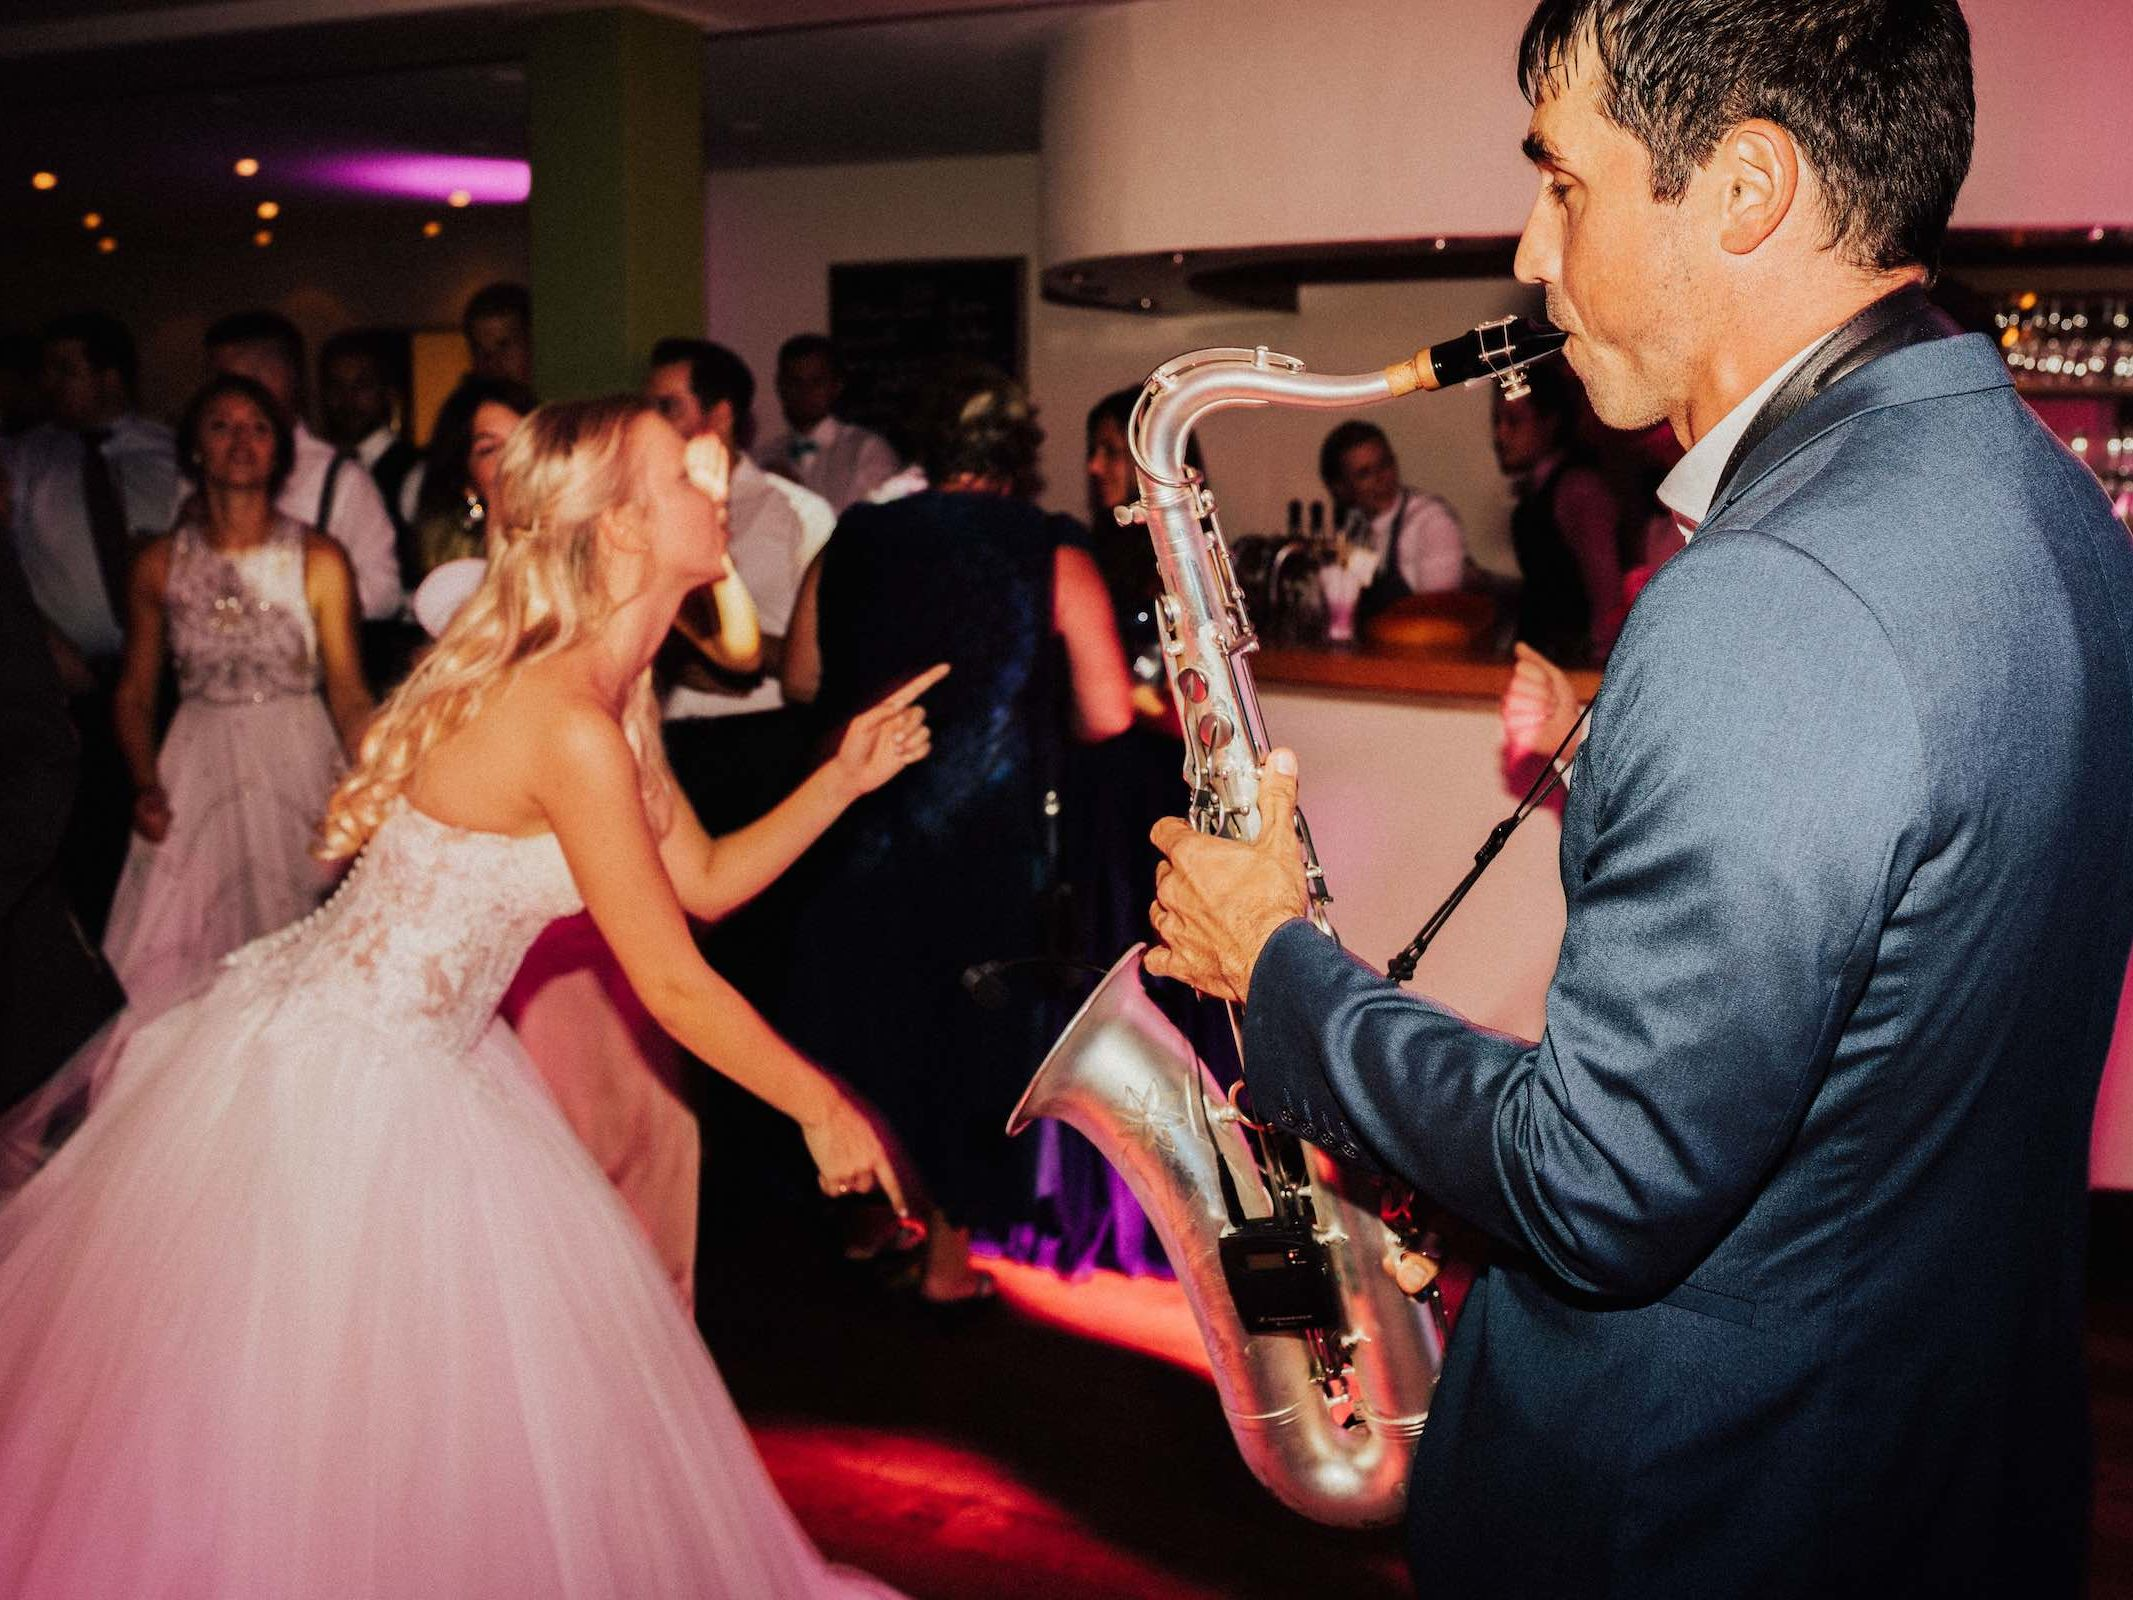 Saxophonist |Hannover |Buchen |DJ |Combo |Hochzeit |Empfang |Dinner |Livemusik |Musiker |Künstler |Party |Swing |House |90er |Electro |Lounge |Saxophon |Messe |Firmenfeier |Charity |Party